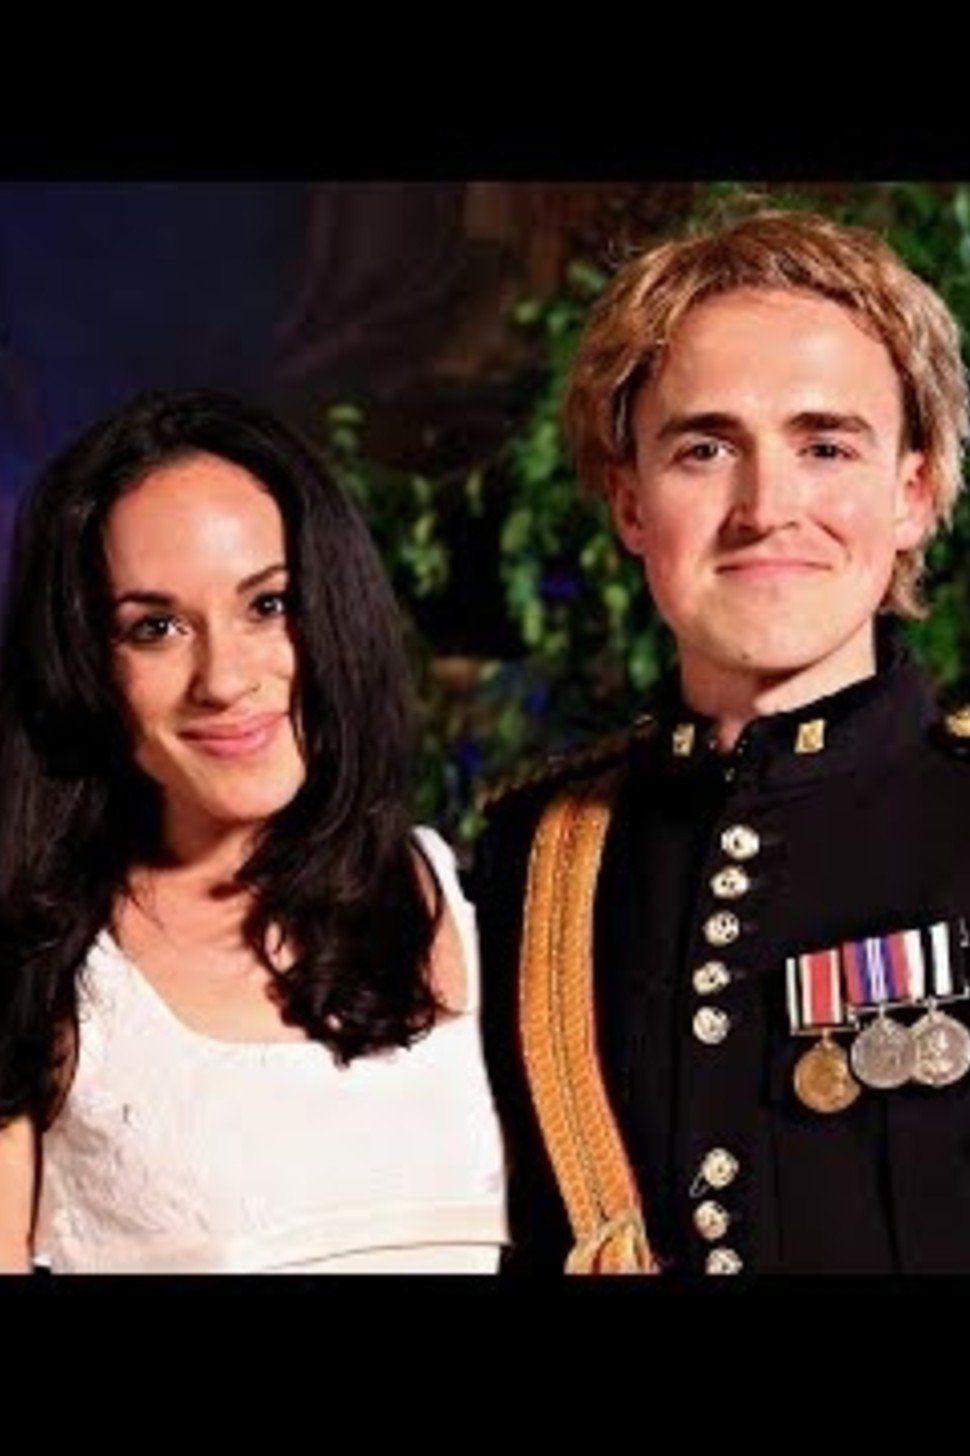 Tom Fletcher Royal Wedding Song Singer, Songs, Tom fletcher